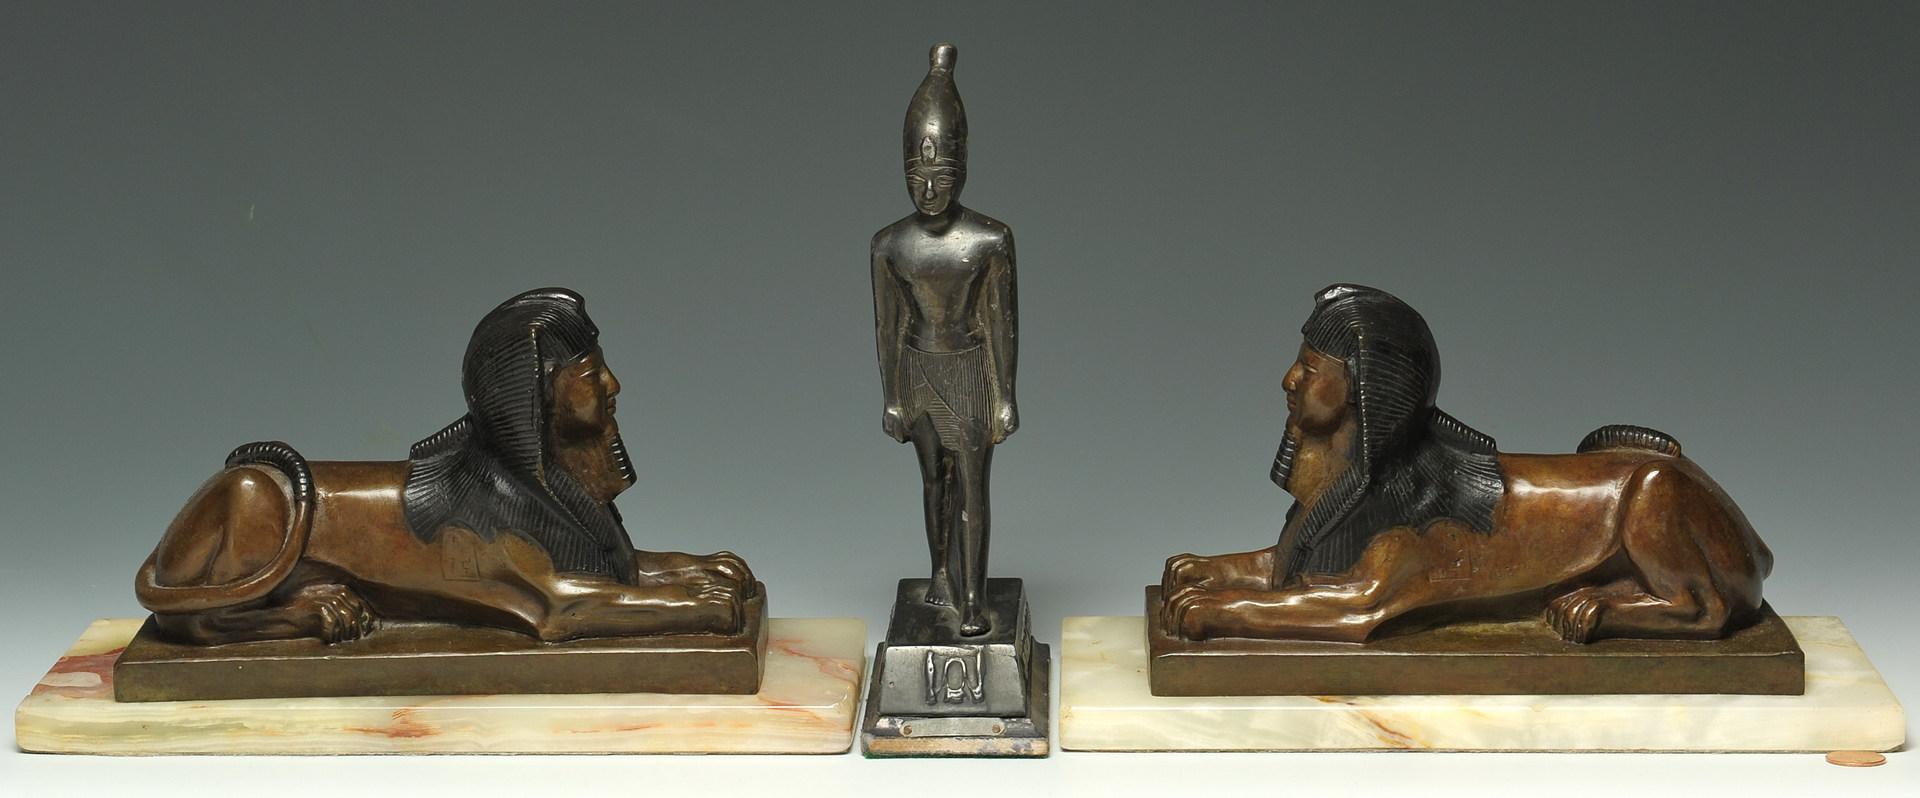 Lot 326: 3 Egyptian-themed bronze desk items